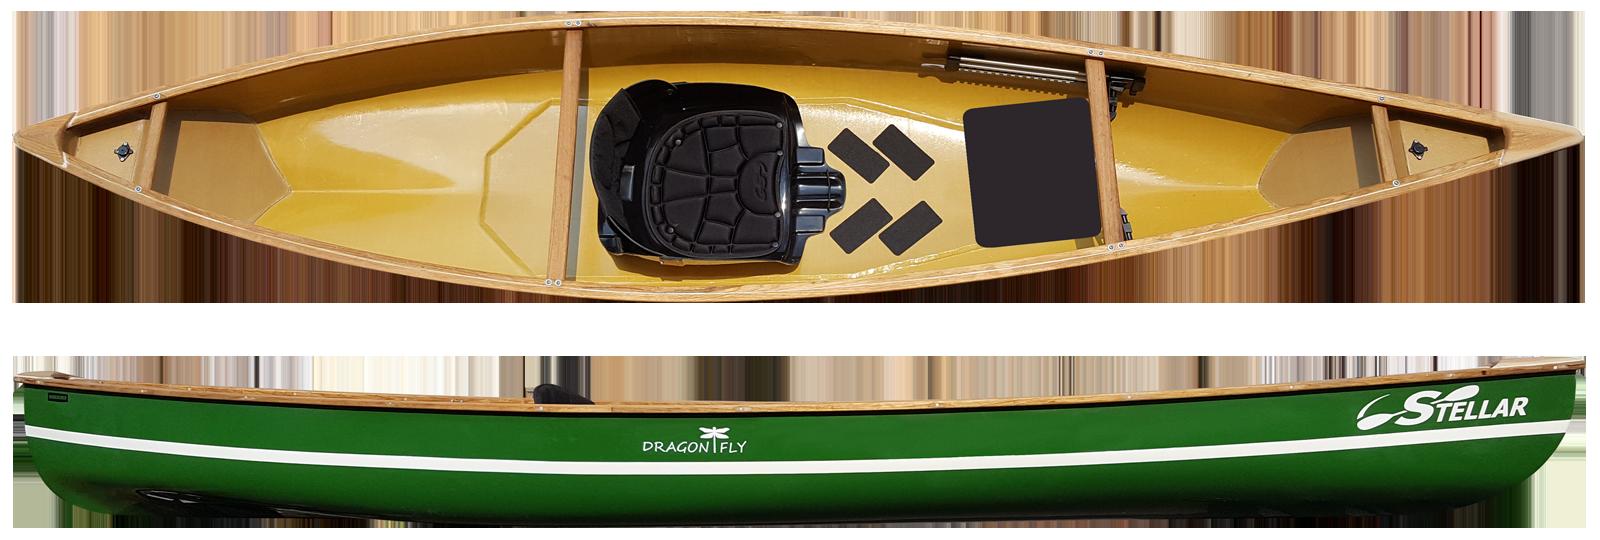 Dragonfly - Stellar Kayaks USA - Innovative Performance Surf Skis